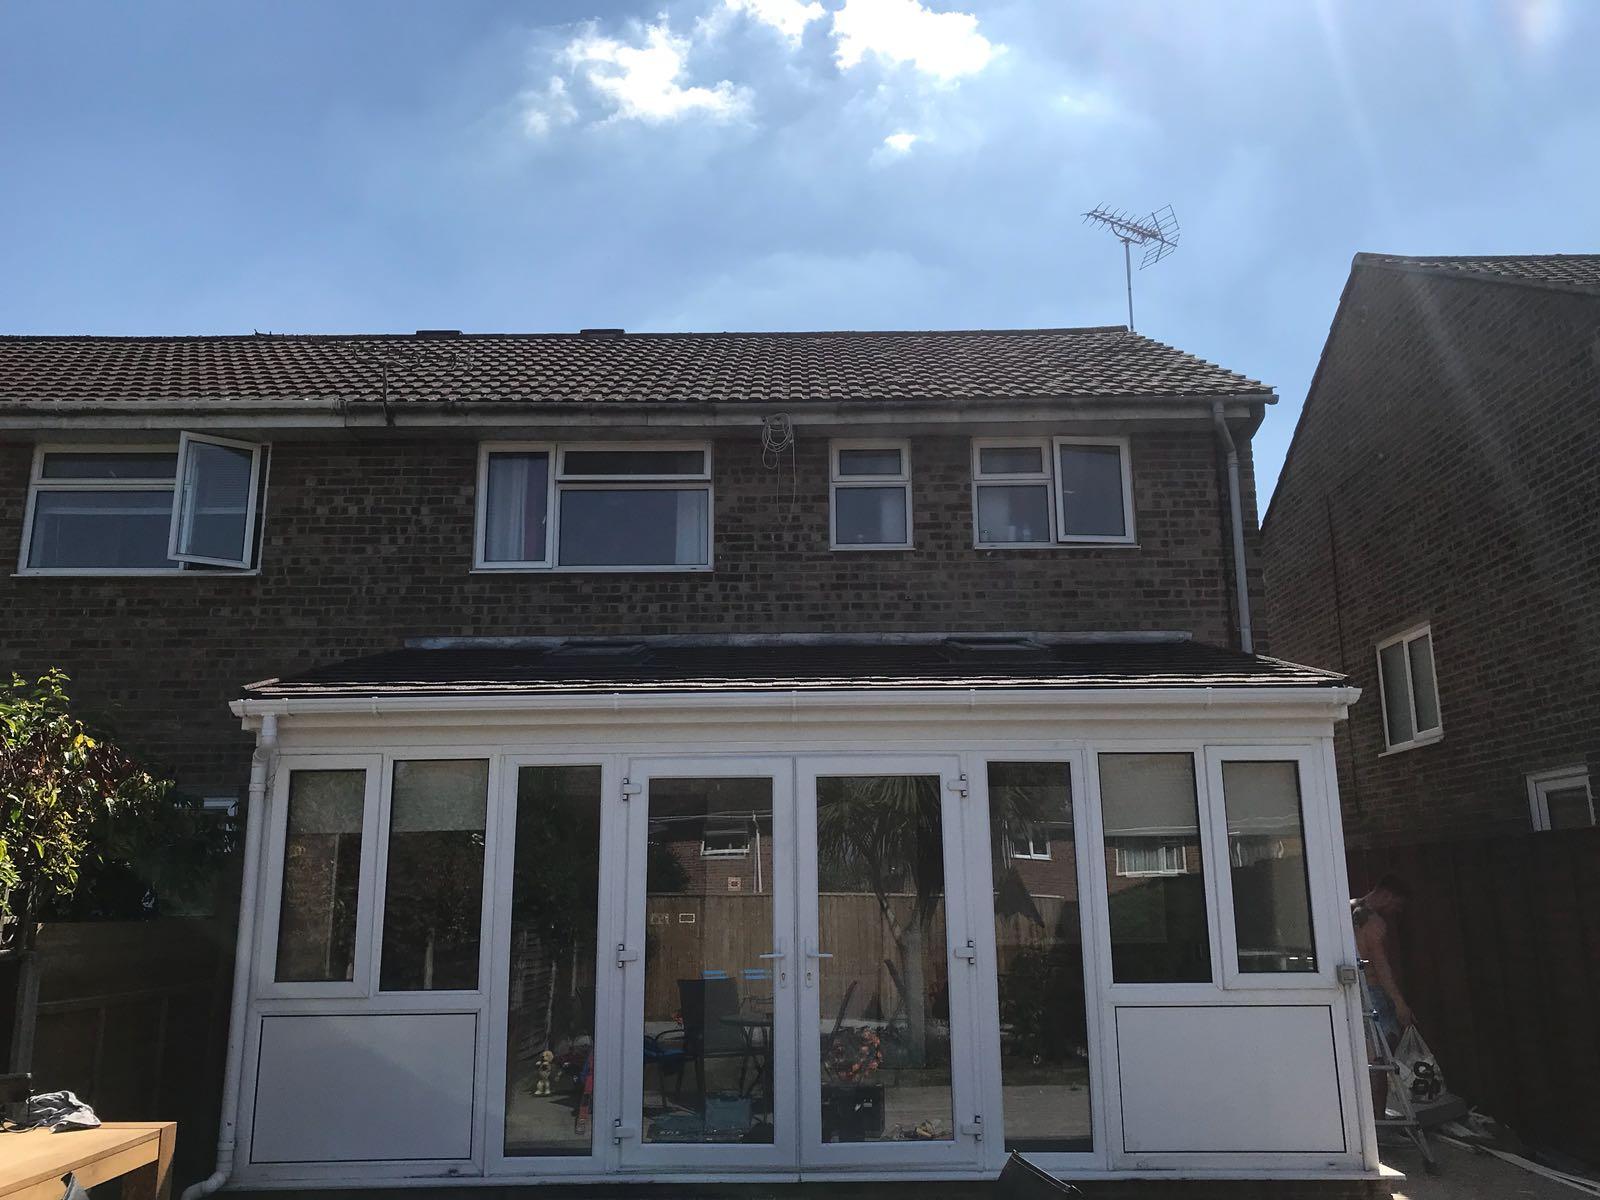 Stonebarrow Ltd Supalite Tiled Roof Systems